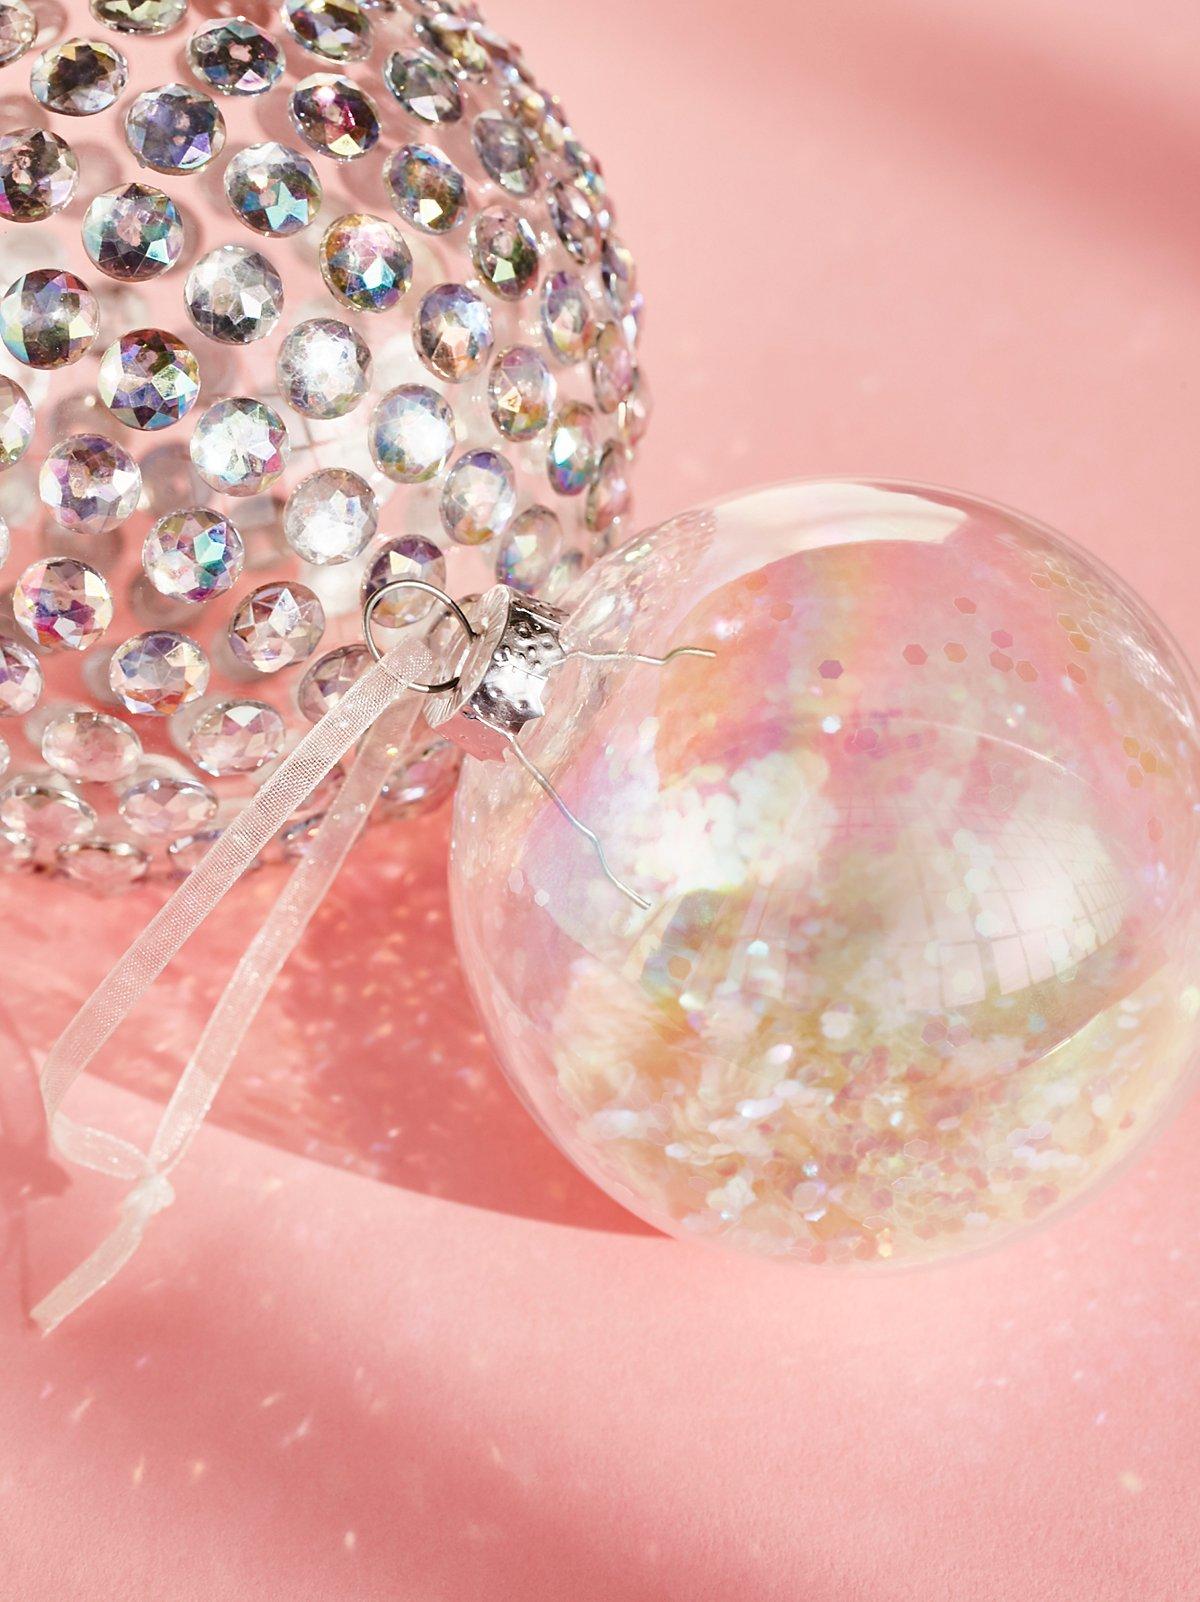 Iridescent Glitter Filled Ornament